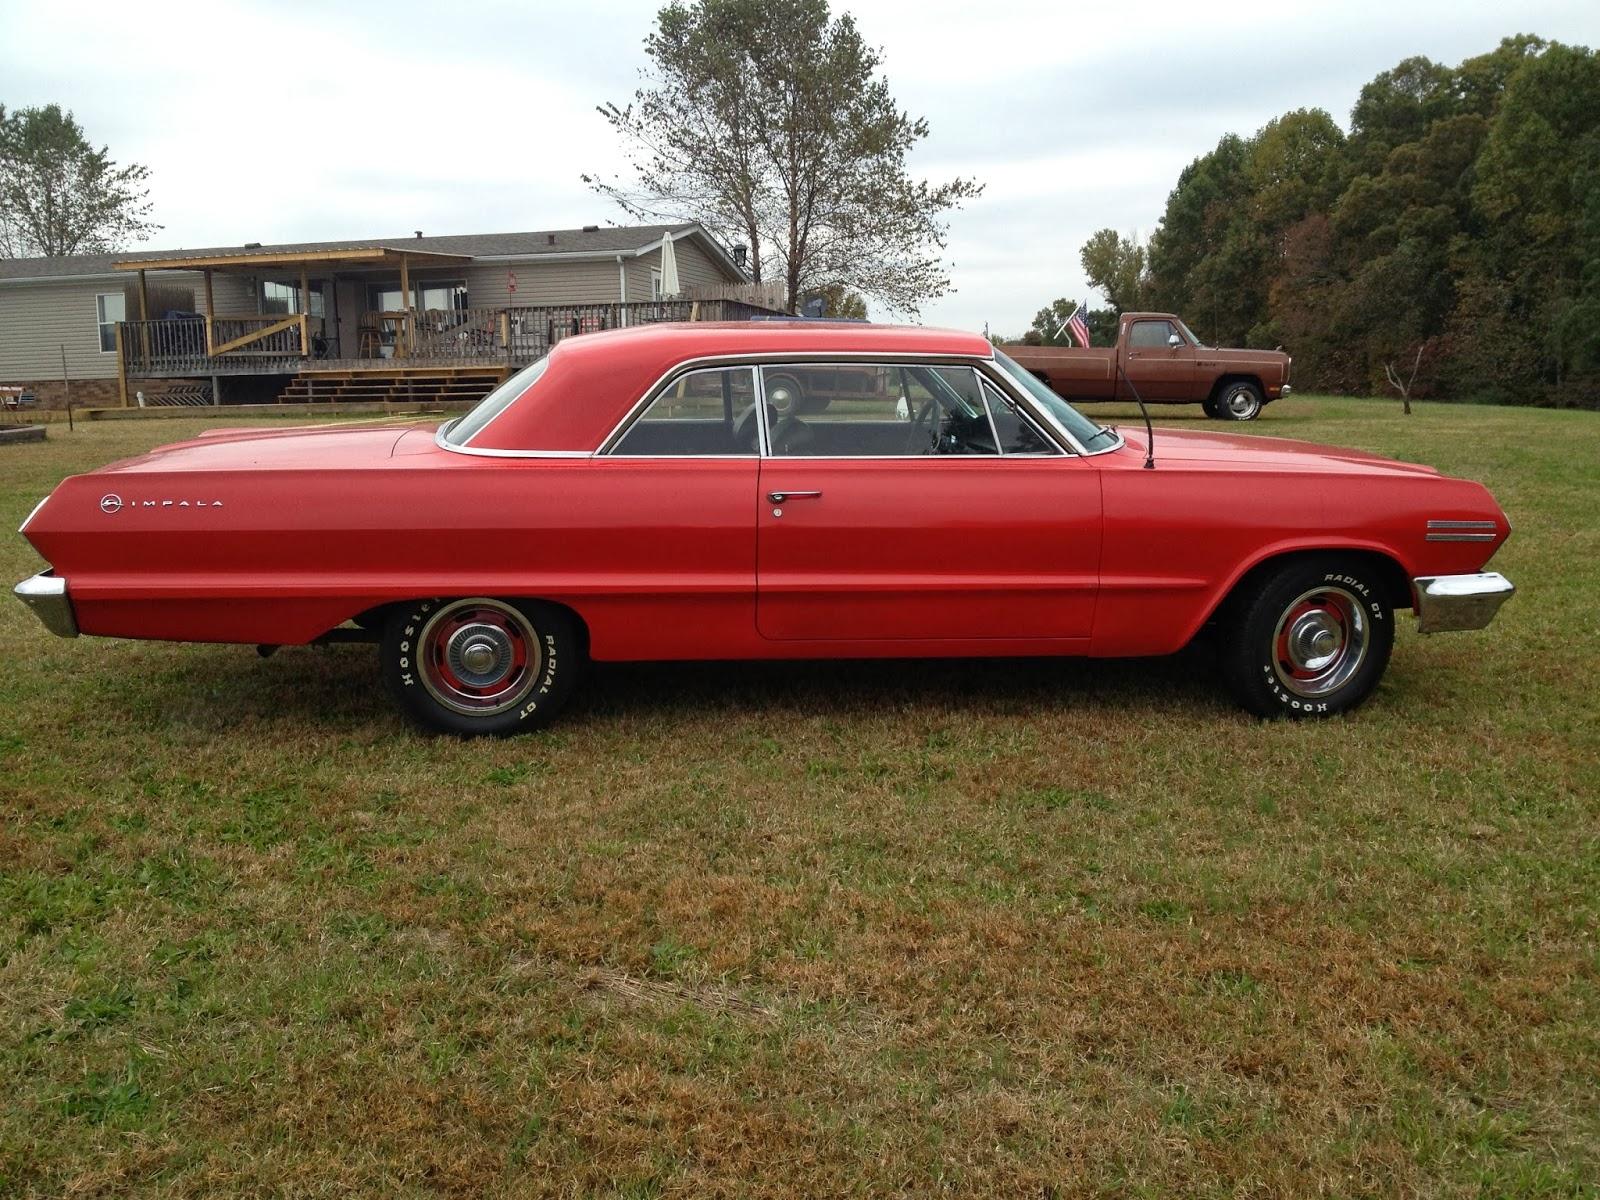 1963 chevrolet impala classic cars for sale. Black Bedroom Furniture Sets. Home Design Ideas